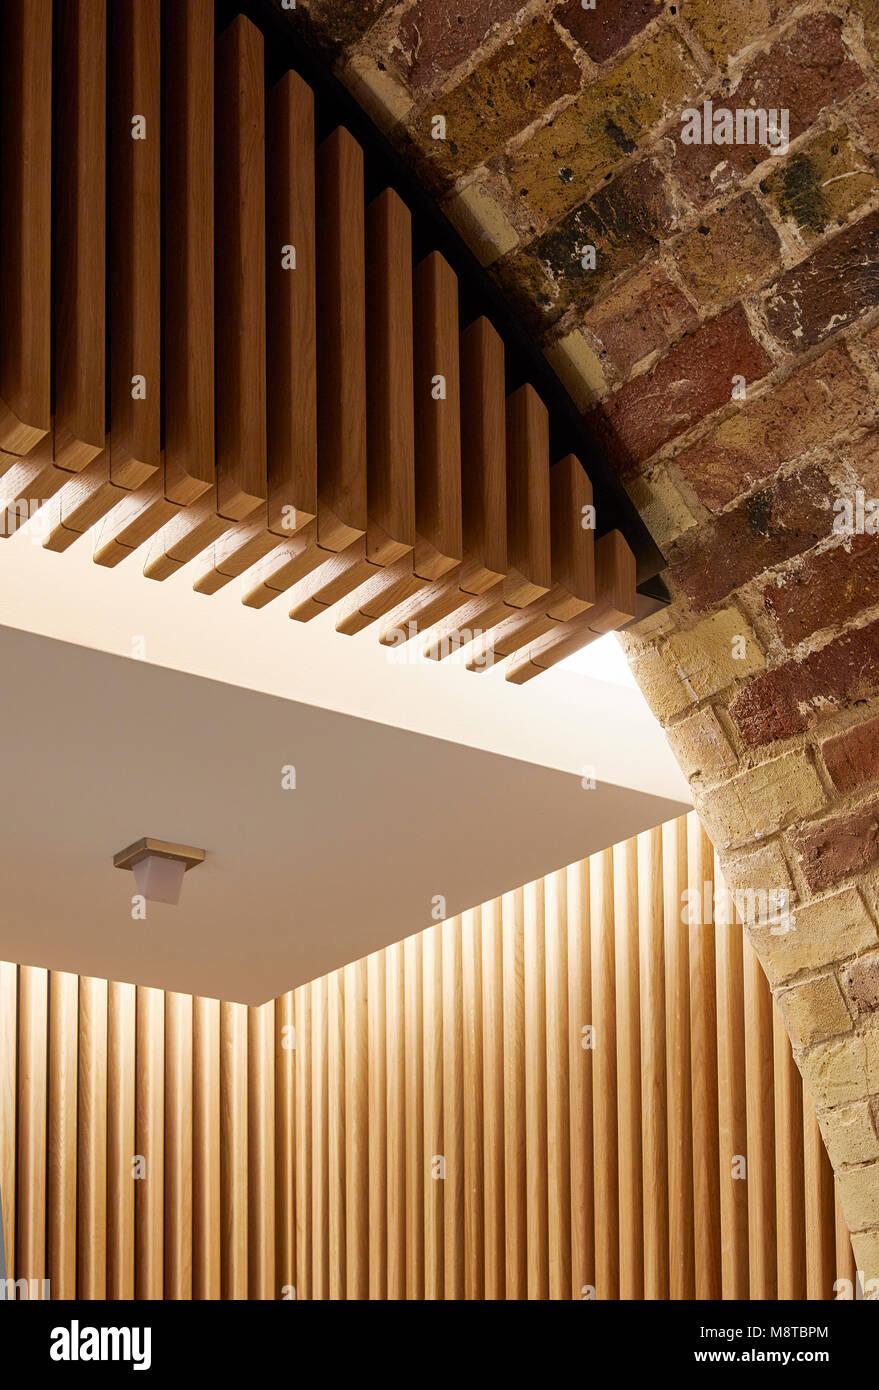 Interior detail. The River Building, London, United Kingdom. Architect: Stiff + Trevillion Architects, 2017. - Stock Image